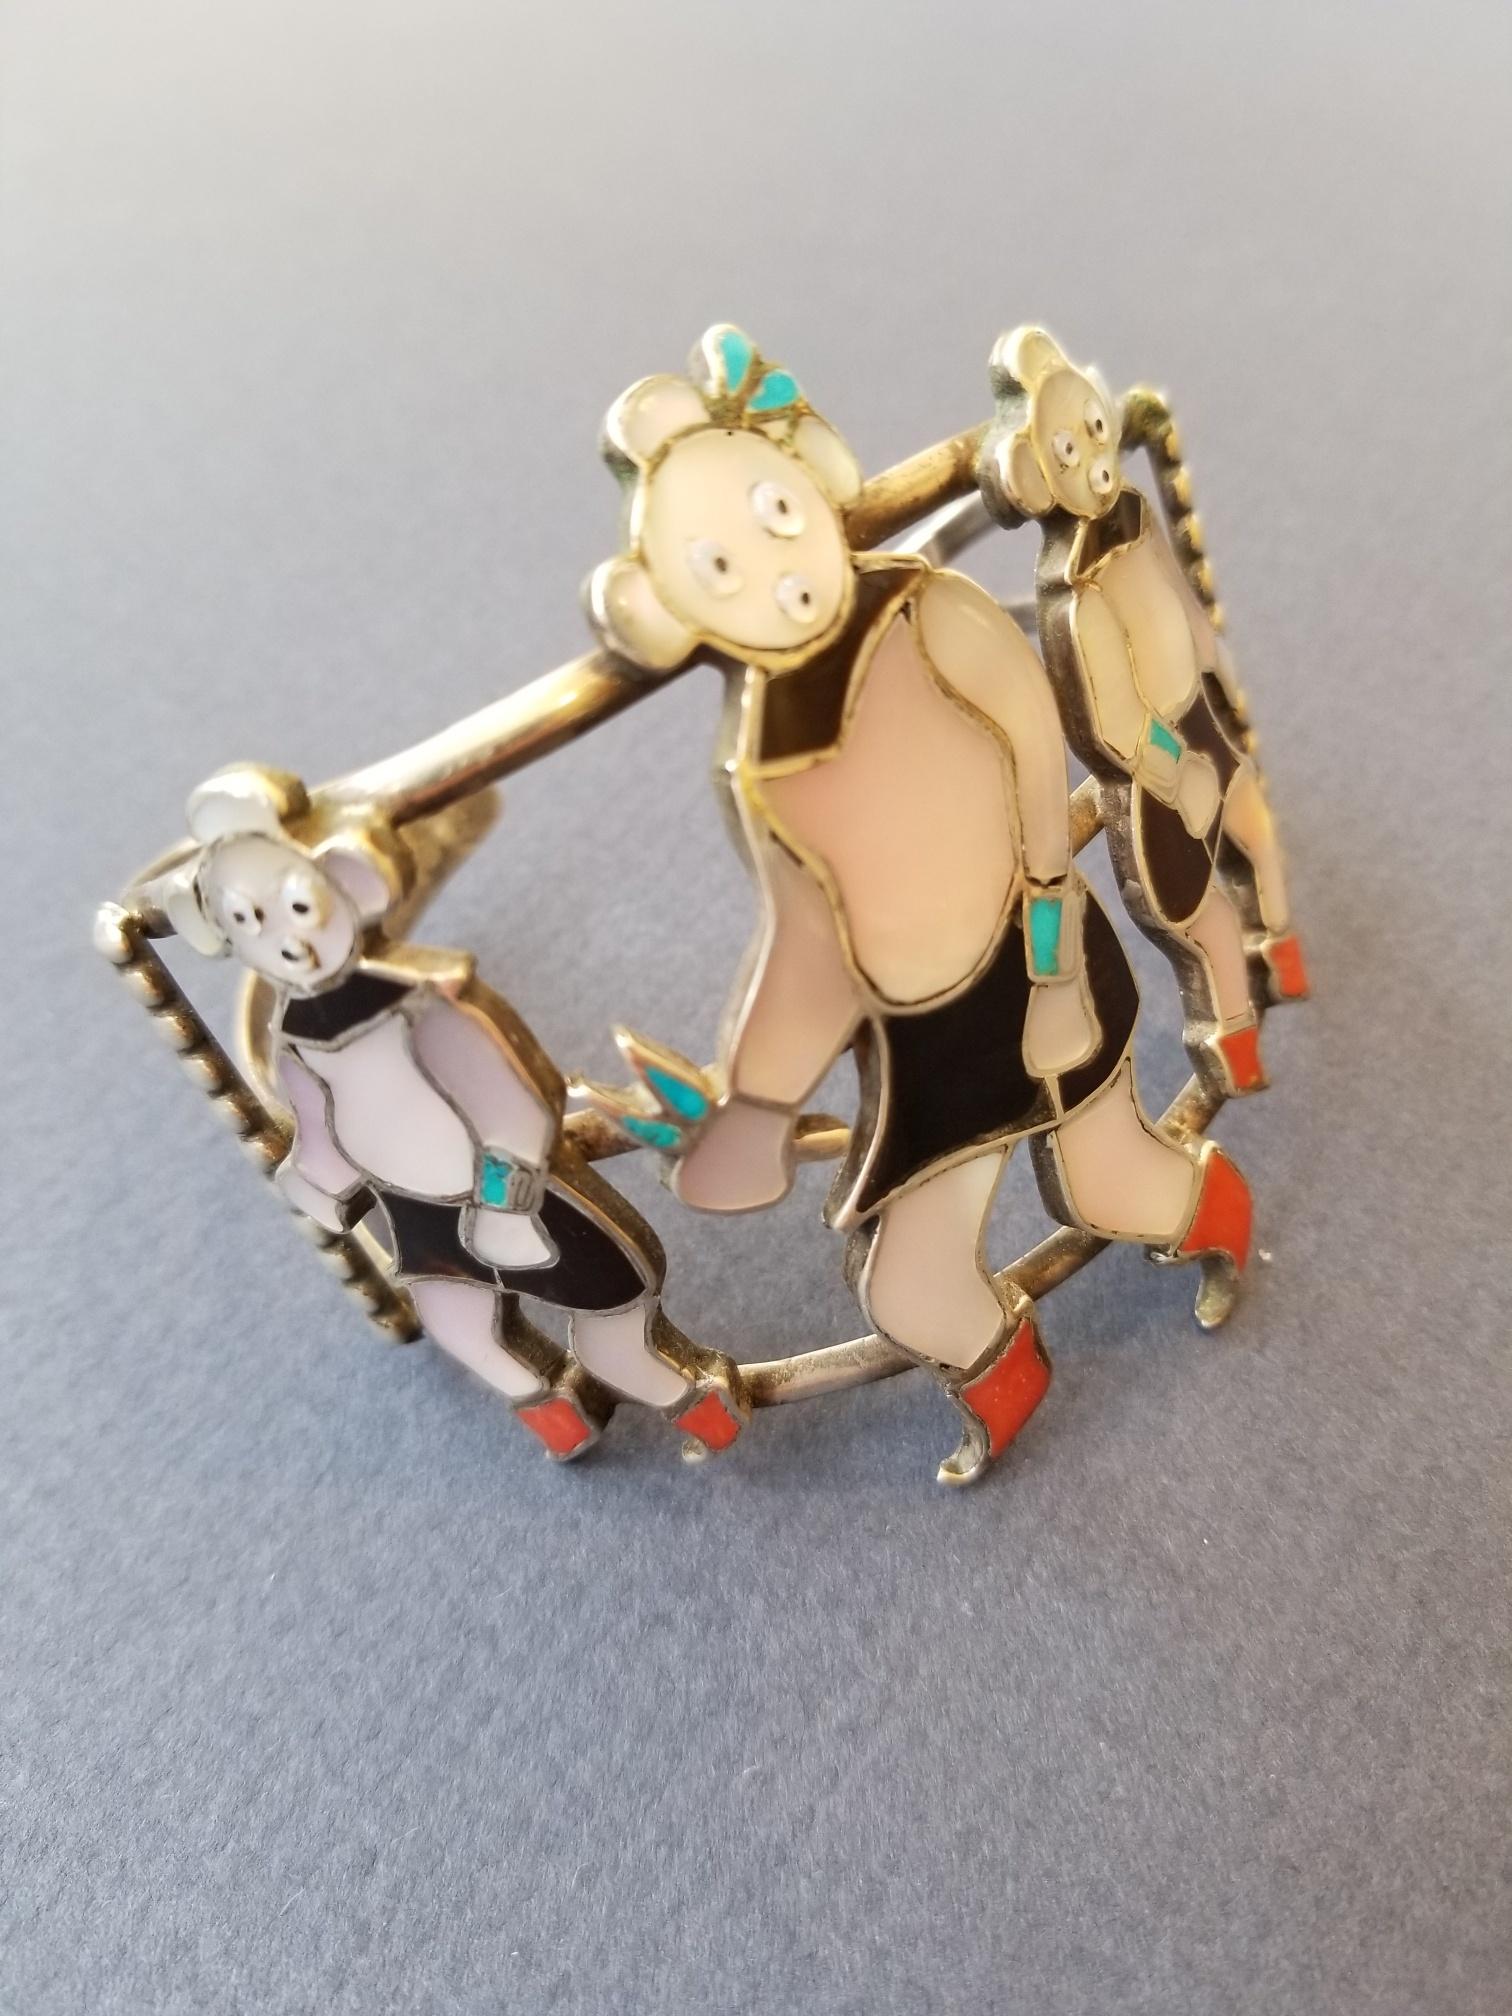 #Koyemshi #Zunijewelry #mudhead